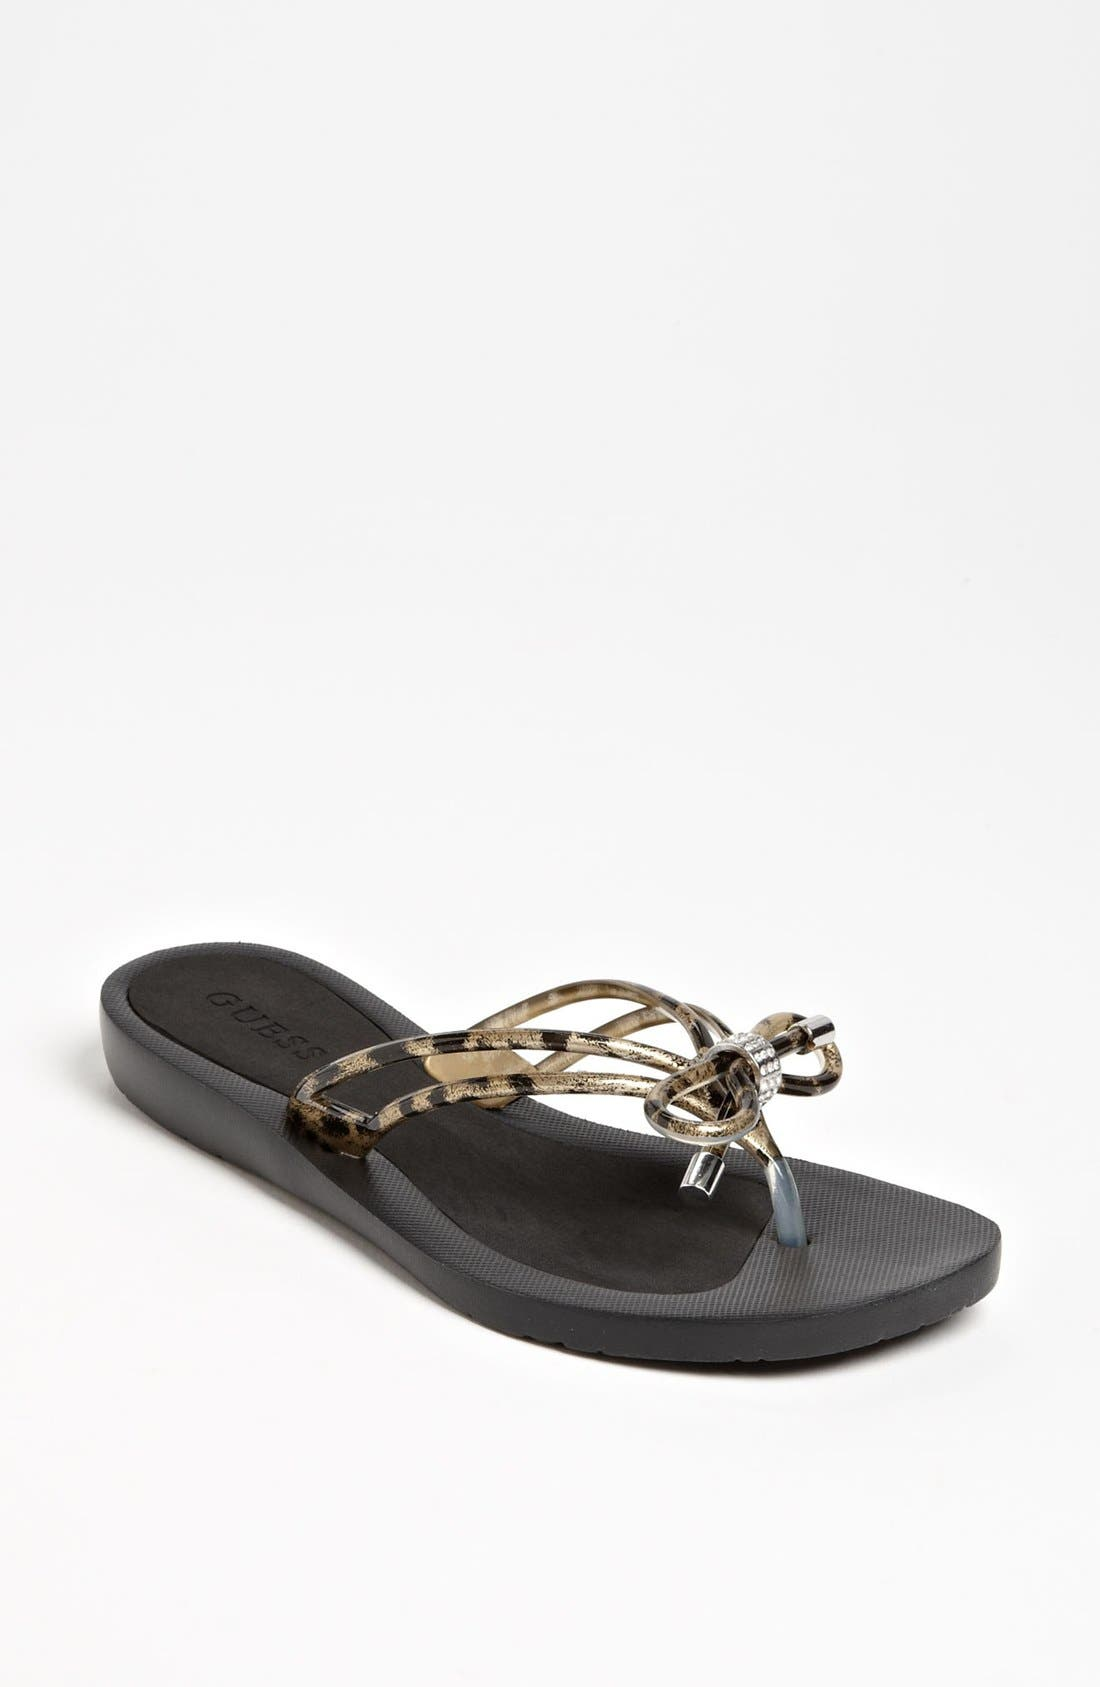 Alternate Image 1 Selected - GUESS 'Talya' Sandal